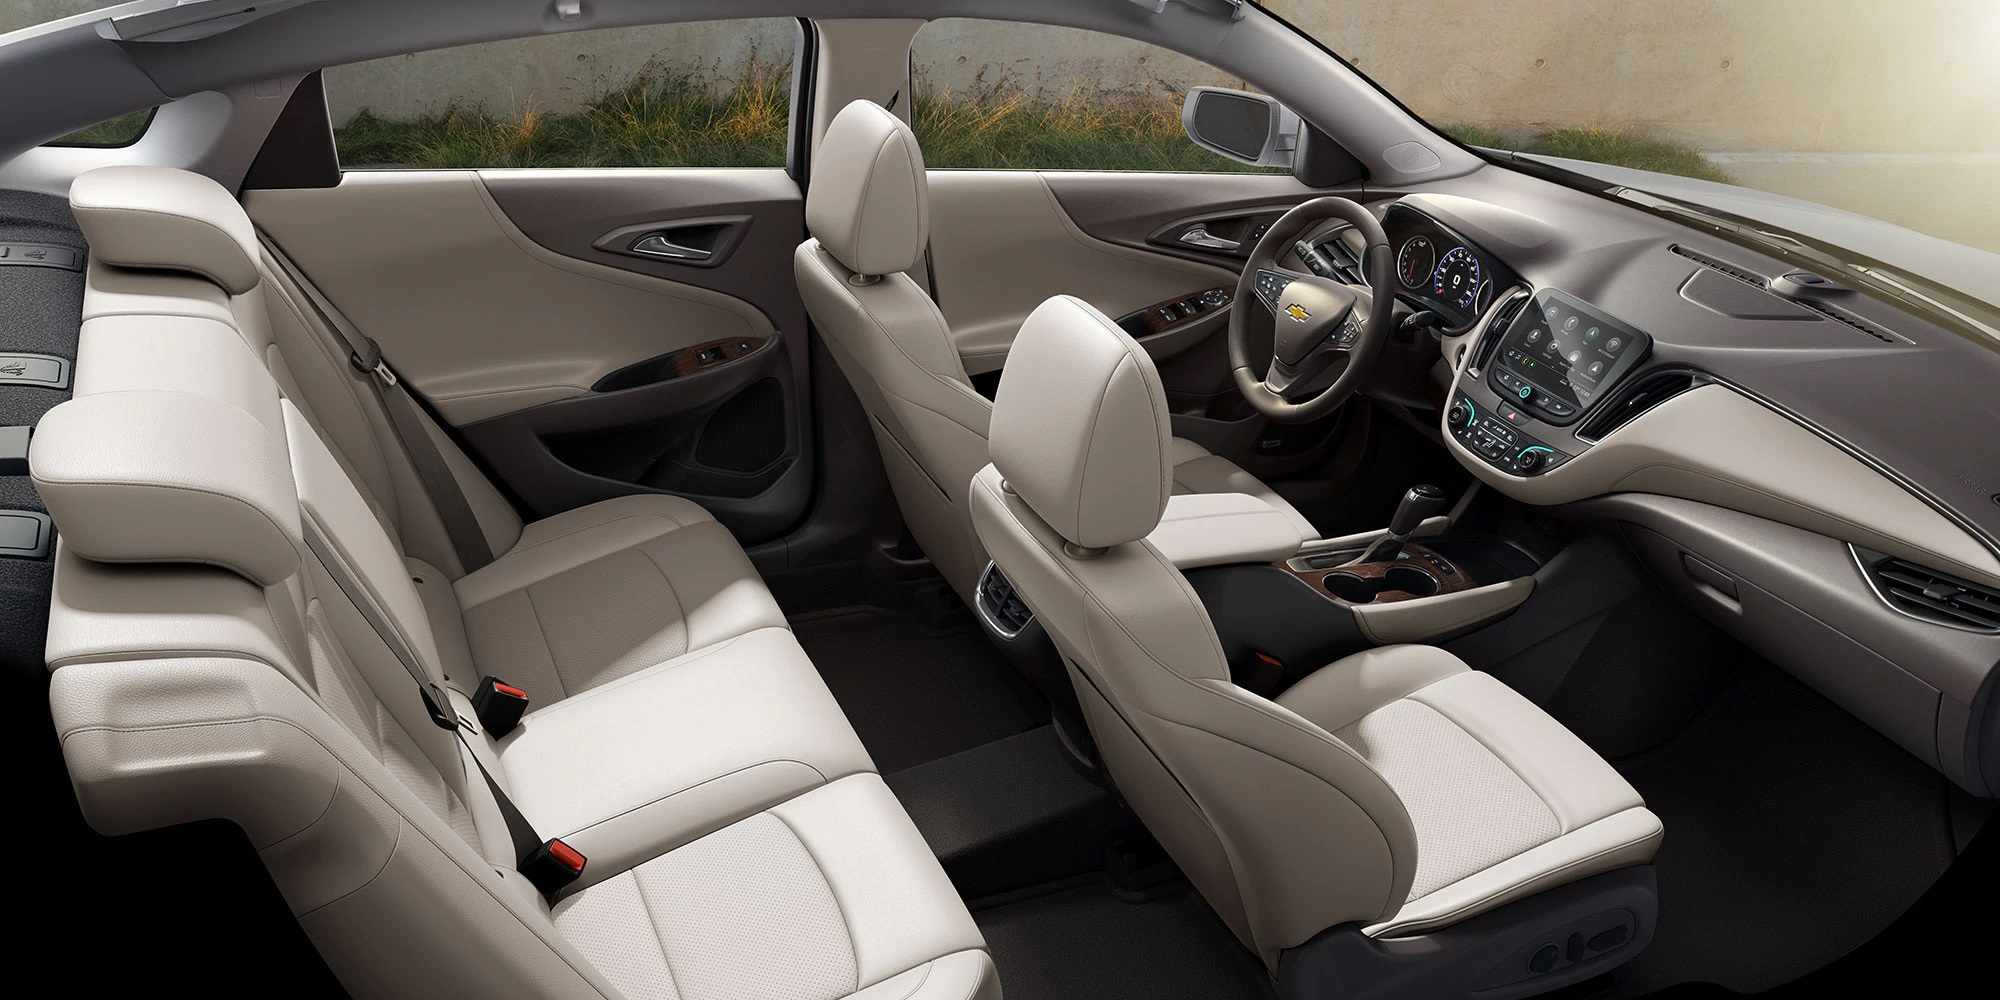 2019 Chevrolet Malibu Cabin